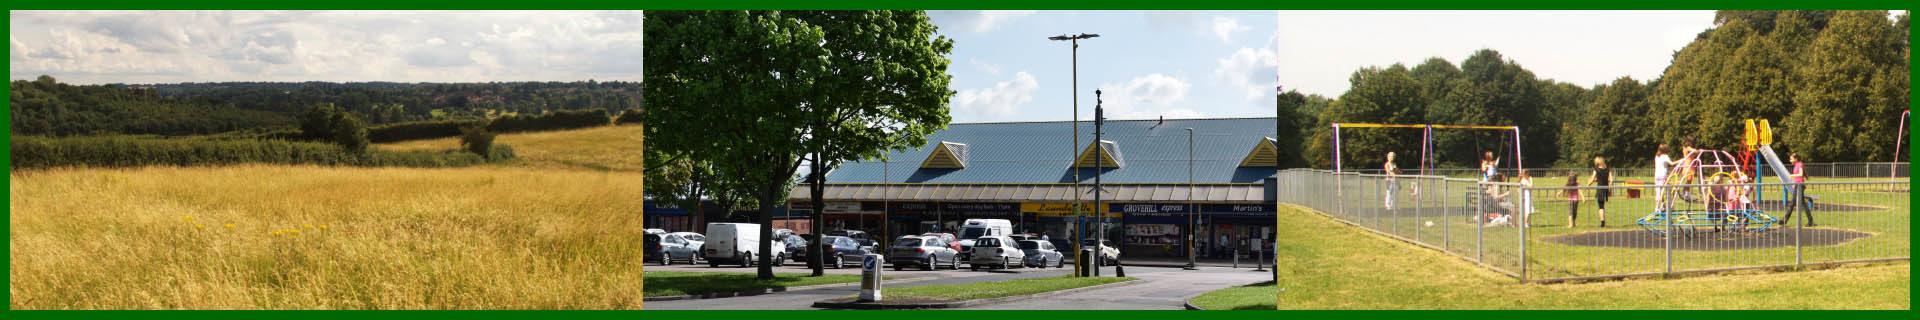 The Grovehill Community Website